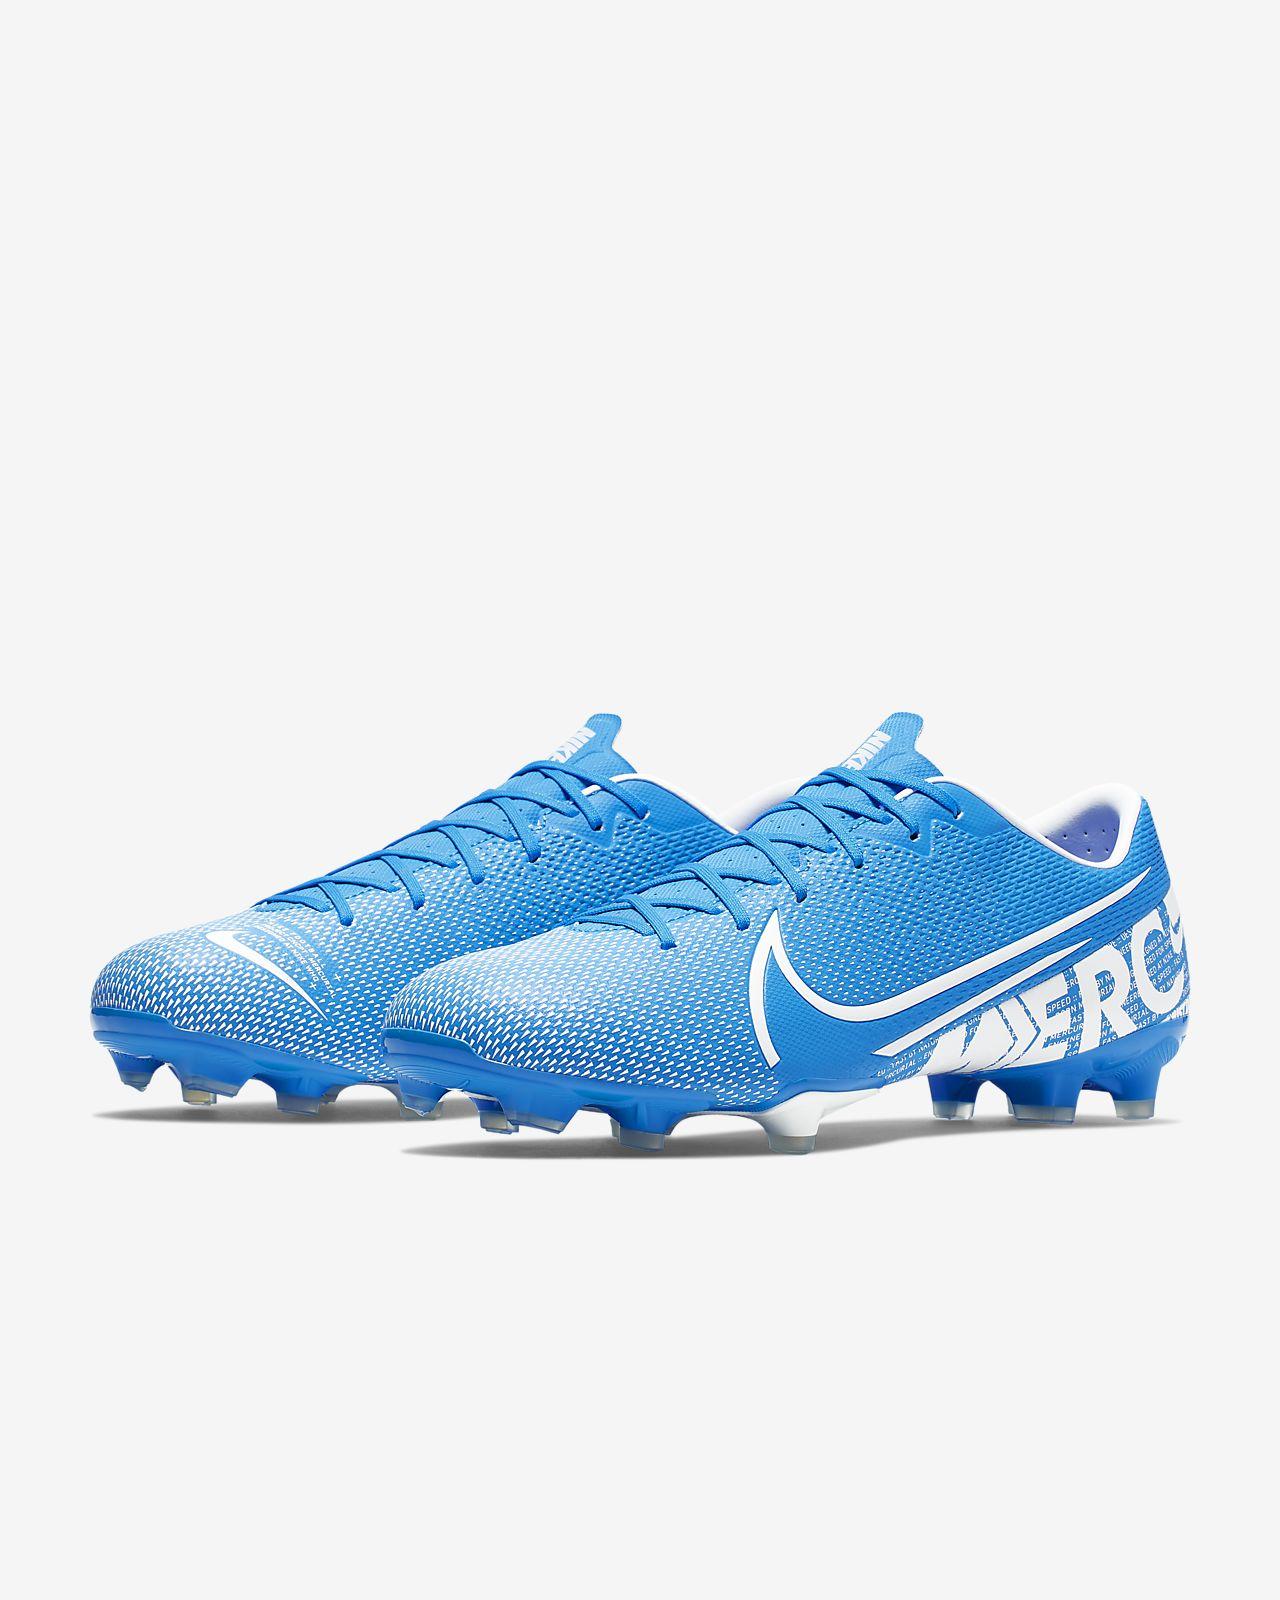 pick up 5dd70 02ef0 Nike Mercurial Vapor 13 Academy MG Multi-Ground Football Boot